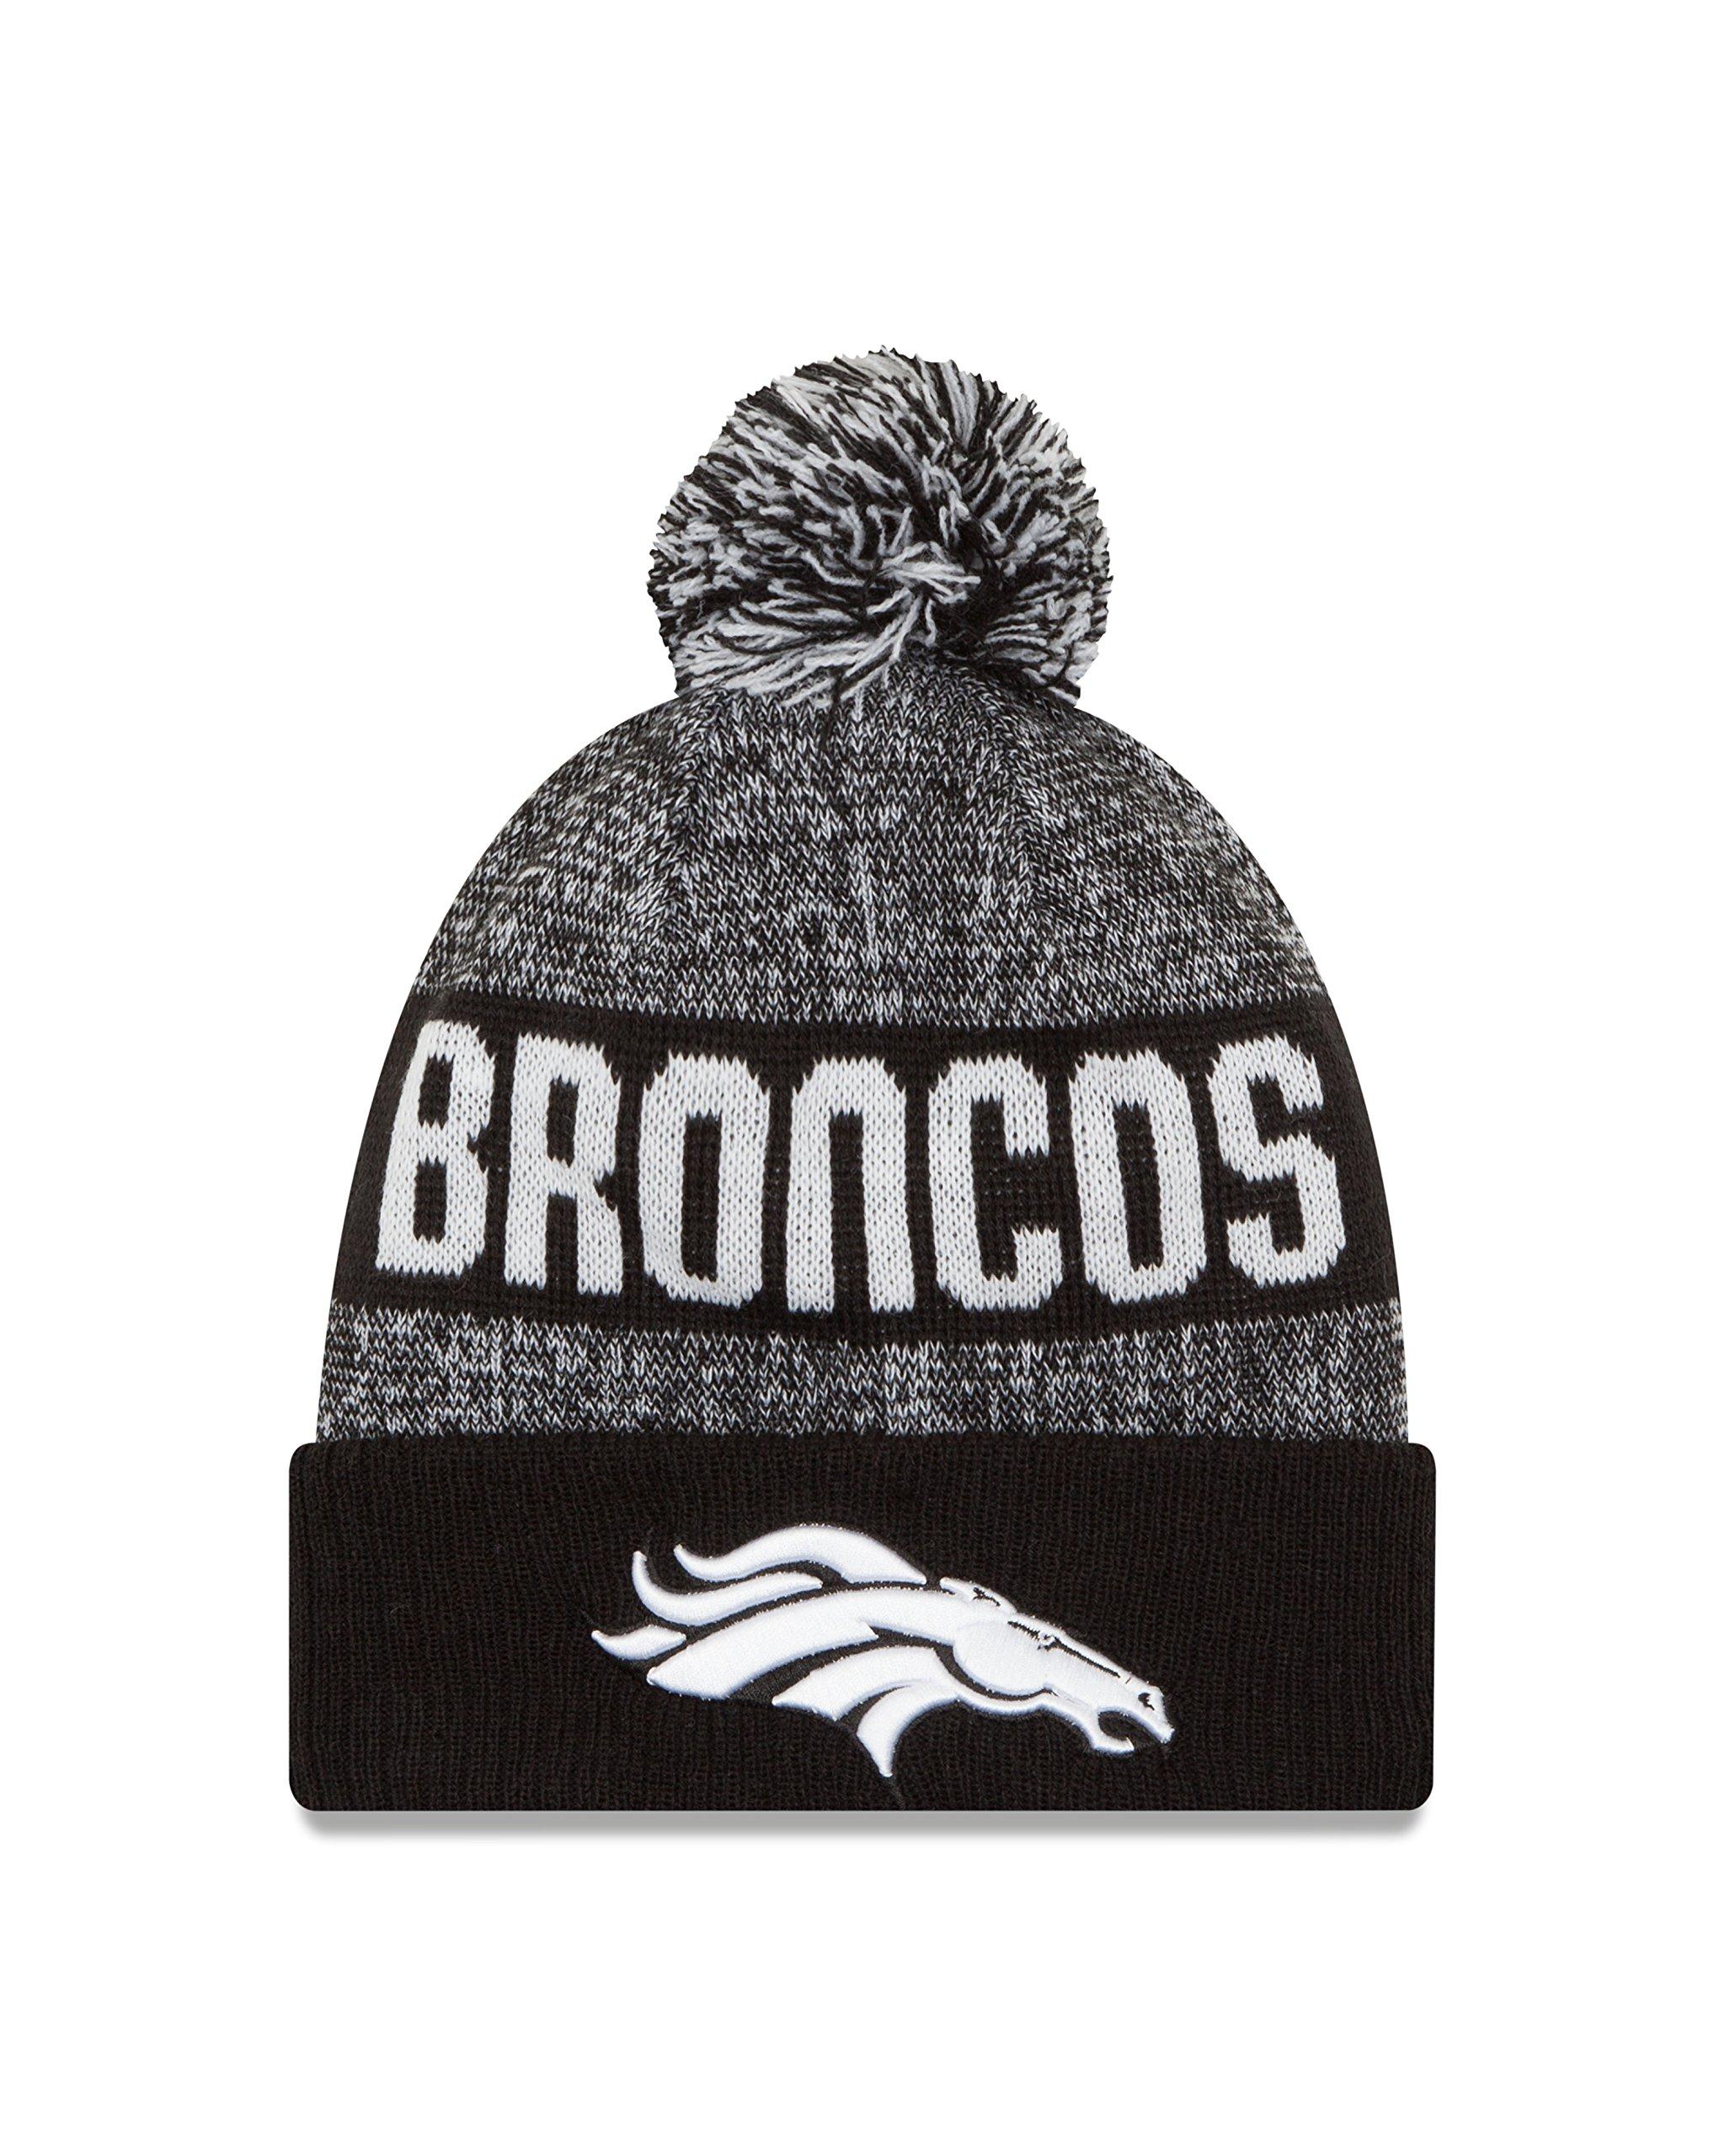 New Era NFL Denver Broncos 2016 Sport Knit Beanie, One Size, Black/White